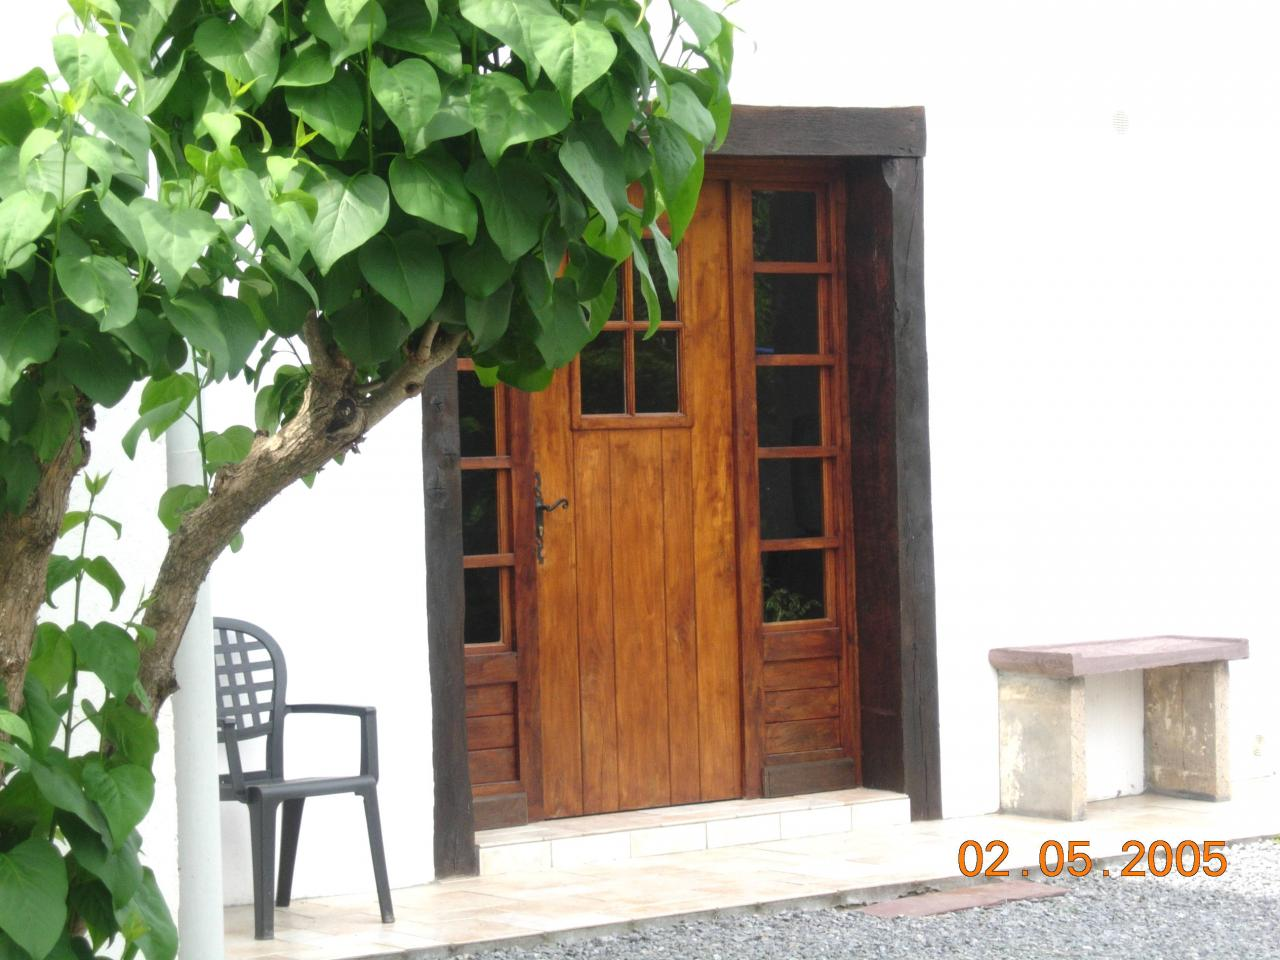 appartement dans maison bunus bunus location pays basque 64. Black Bedroom Furniture Sets. Home Design Ideas